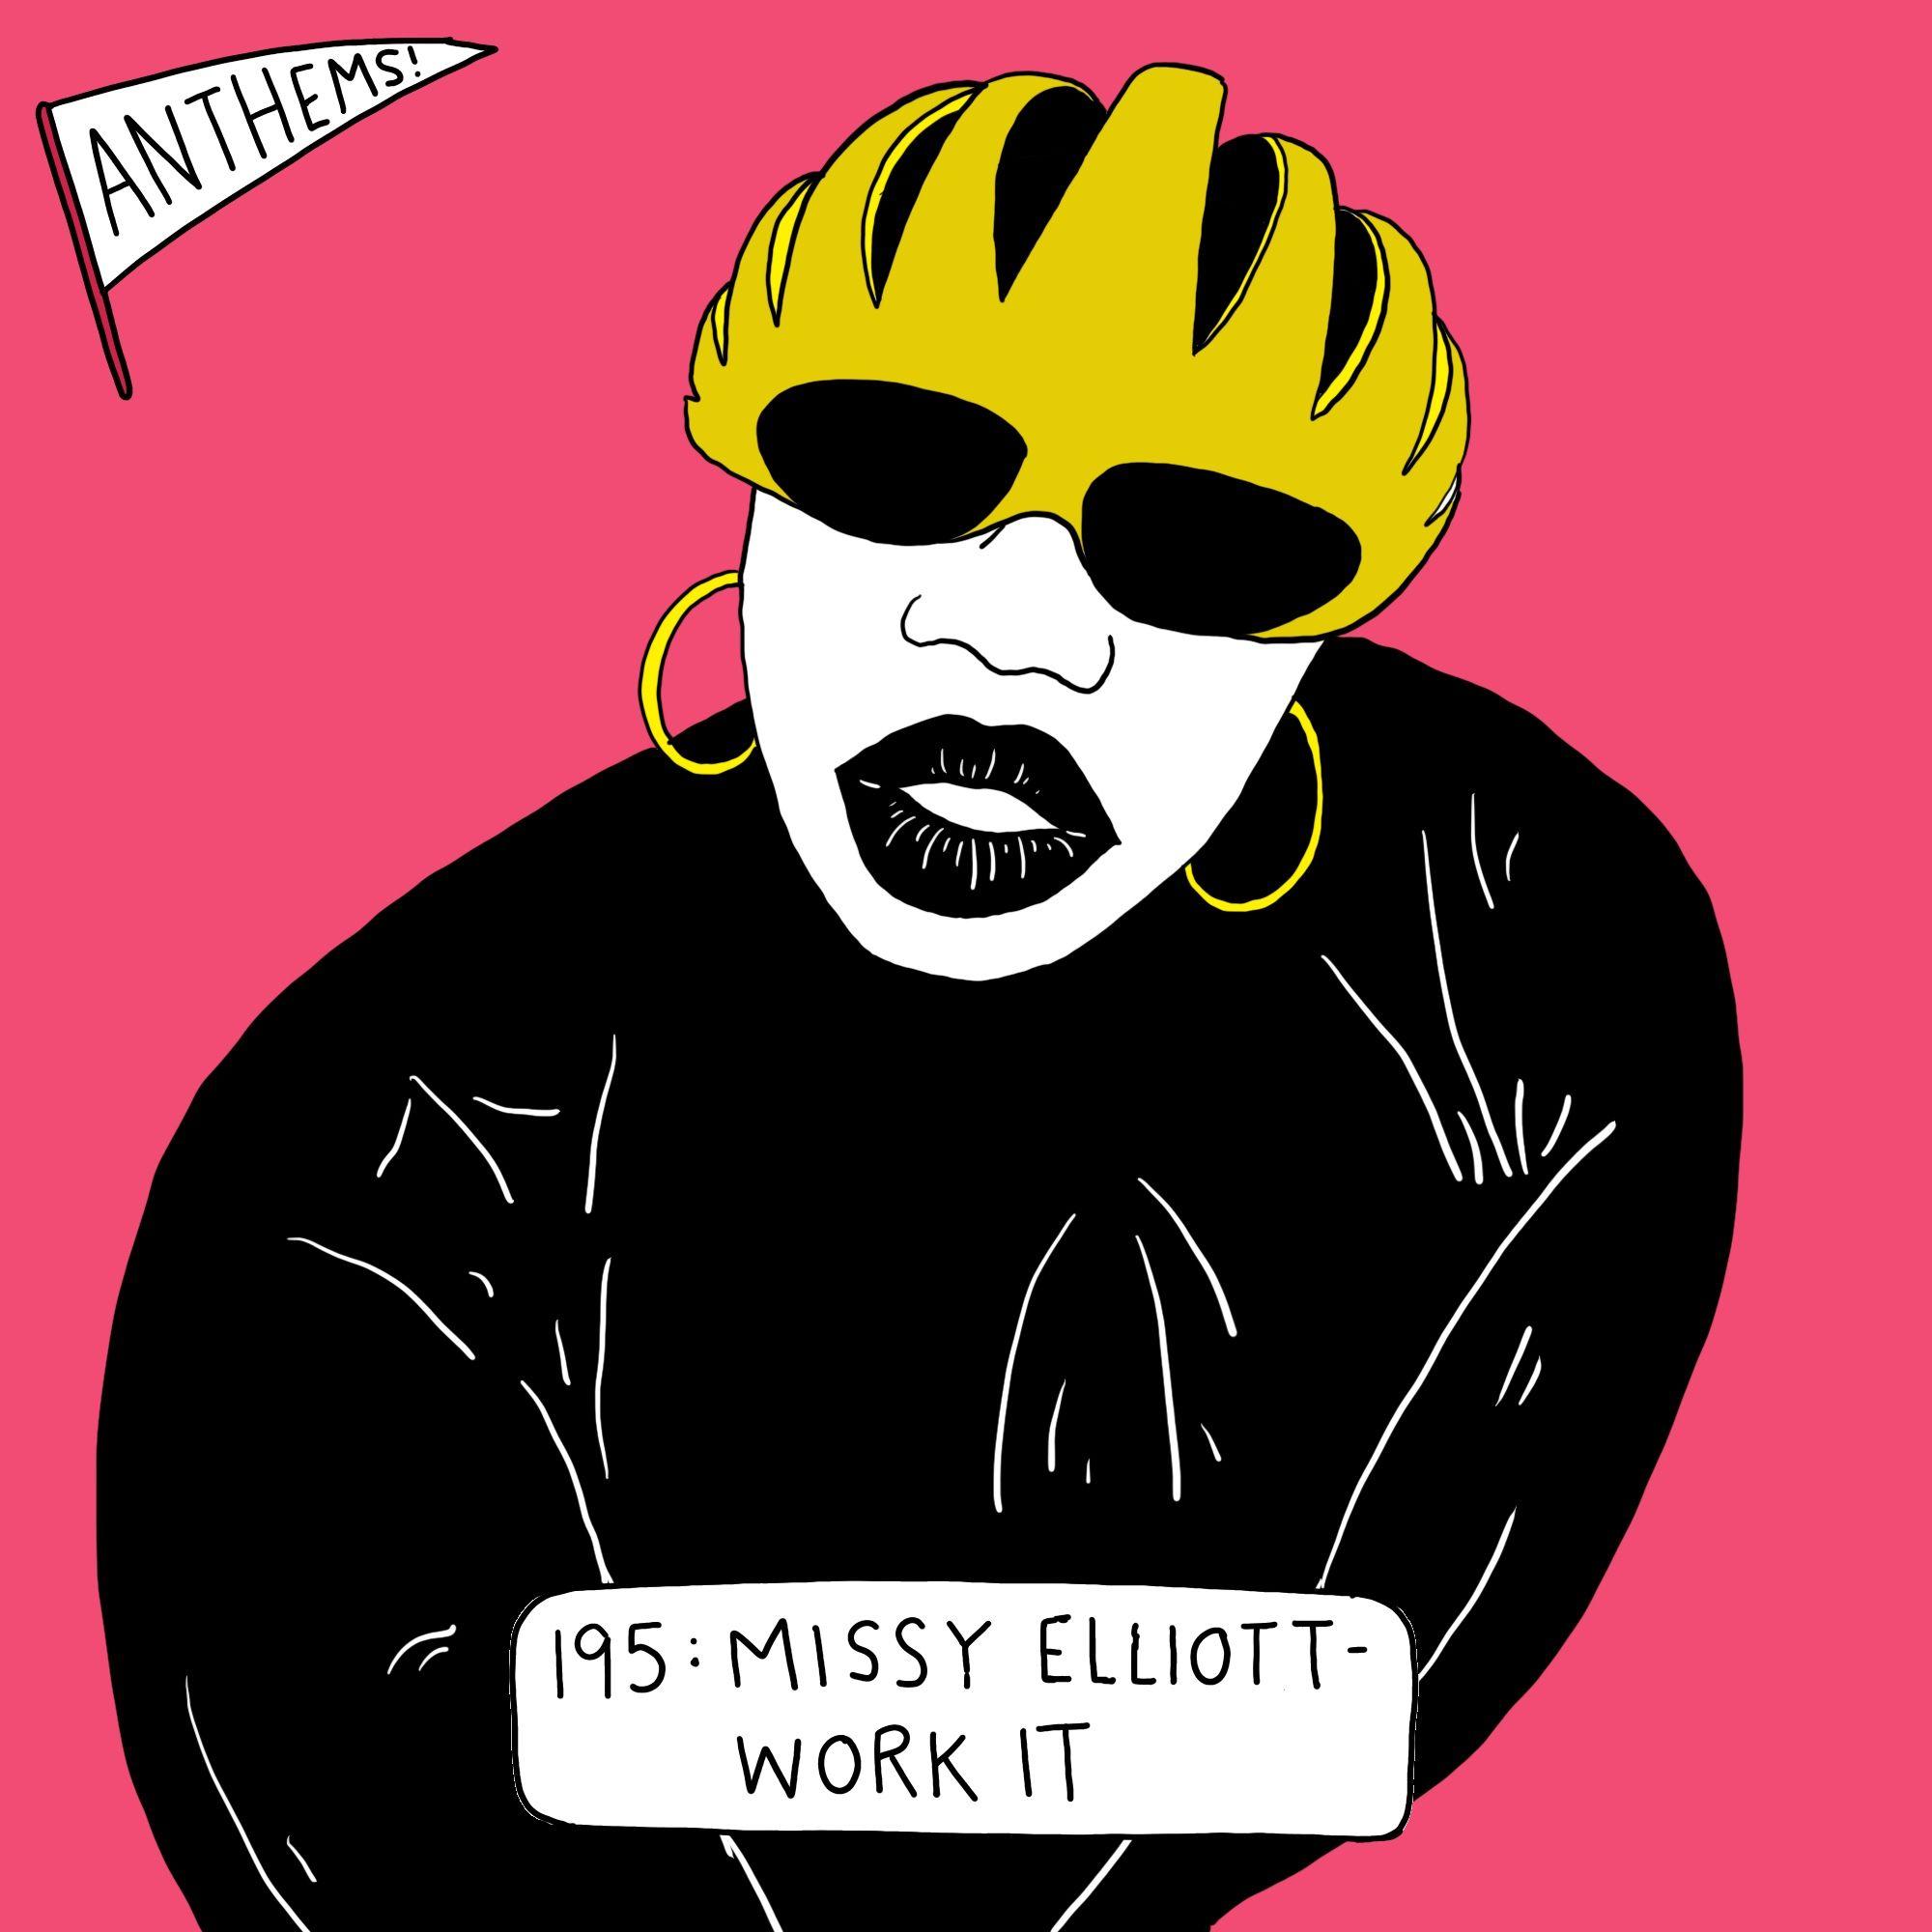 ANTHEMS: Missy Elliott — Work It